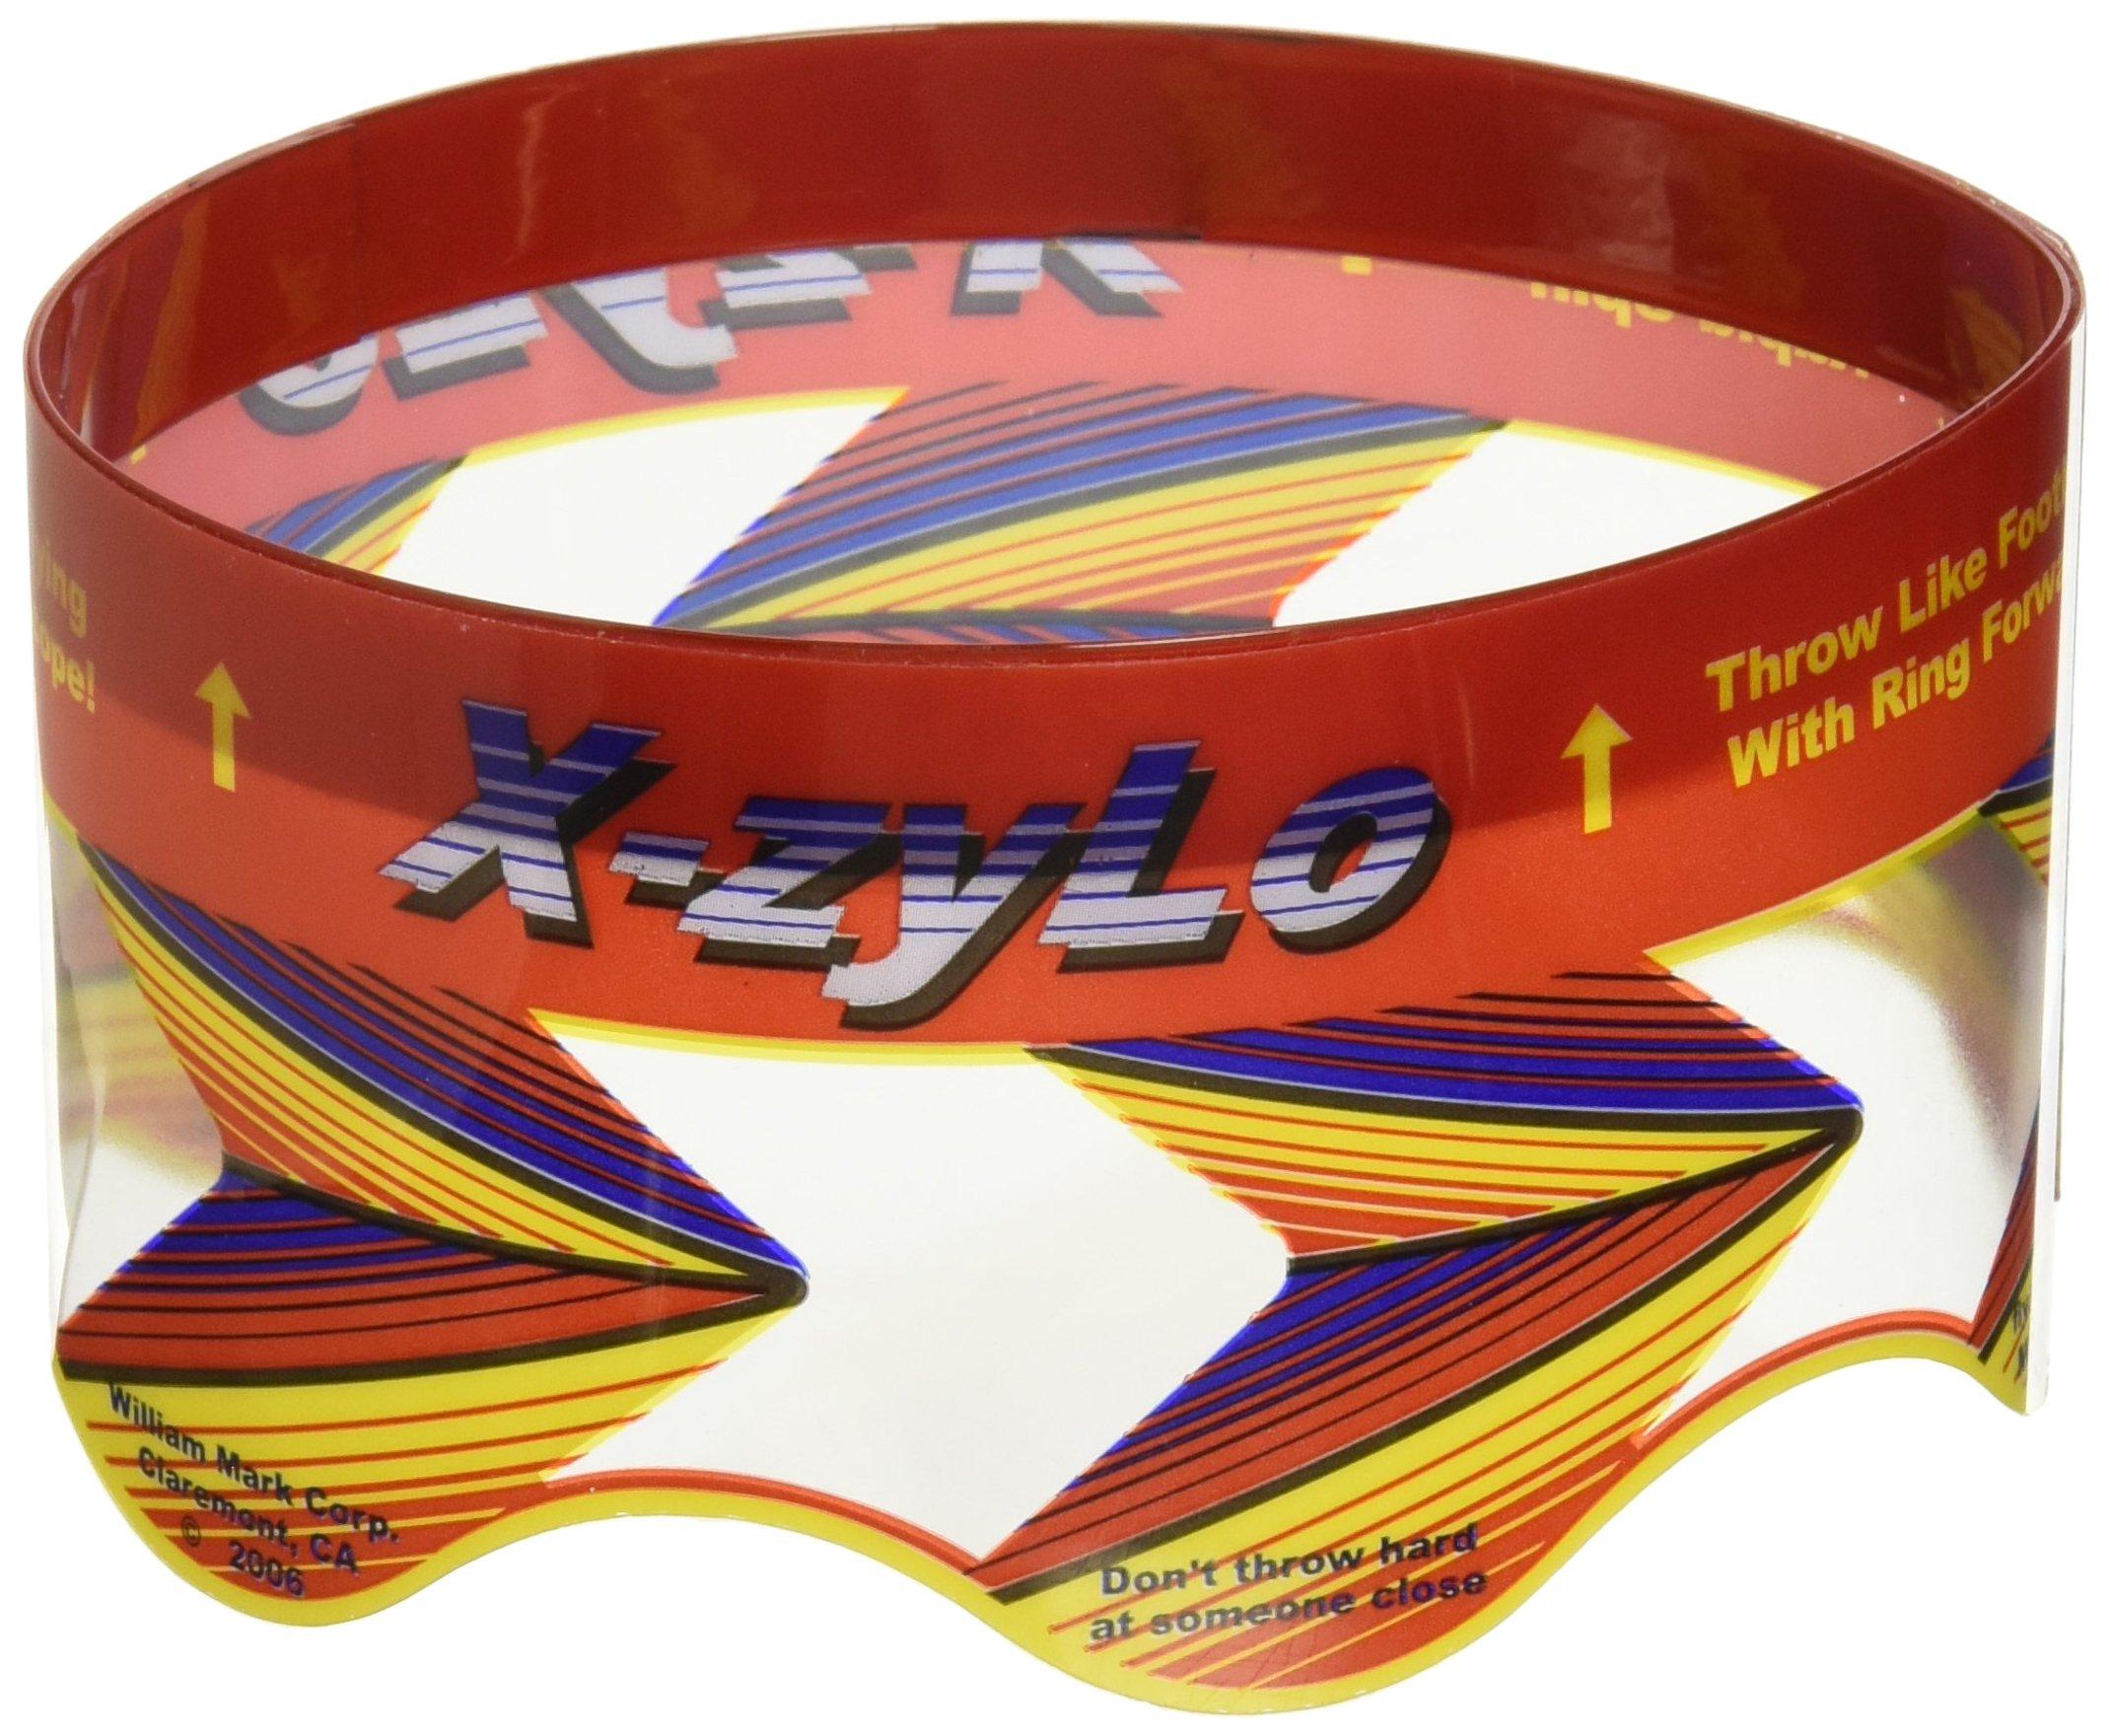 X-zylo Ultra Flying Gyroscope